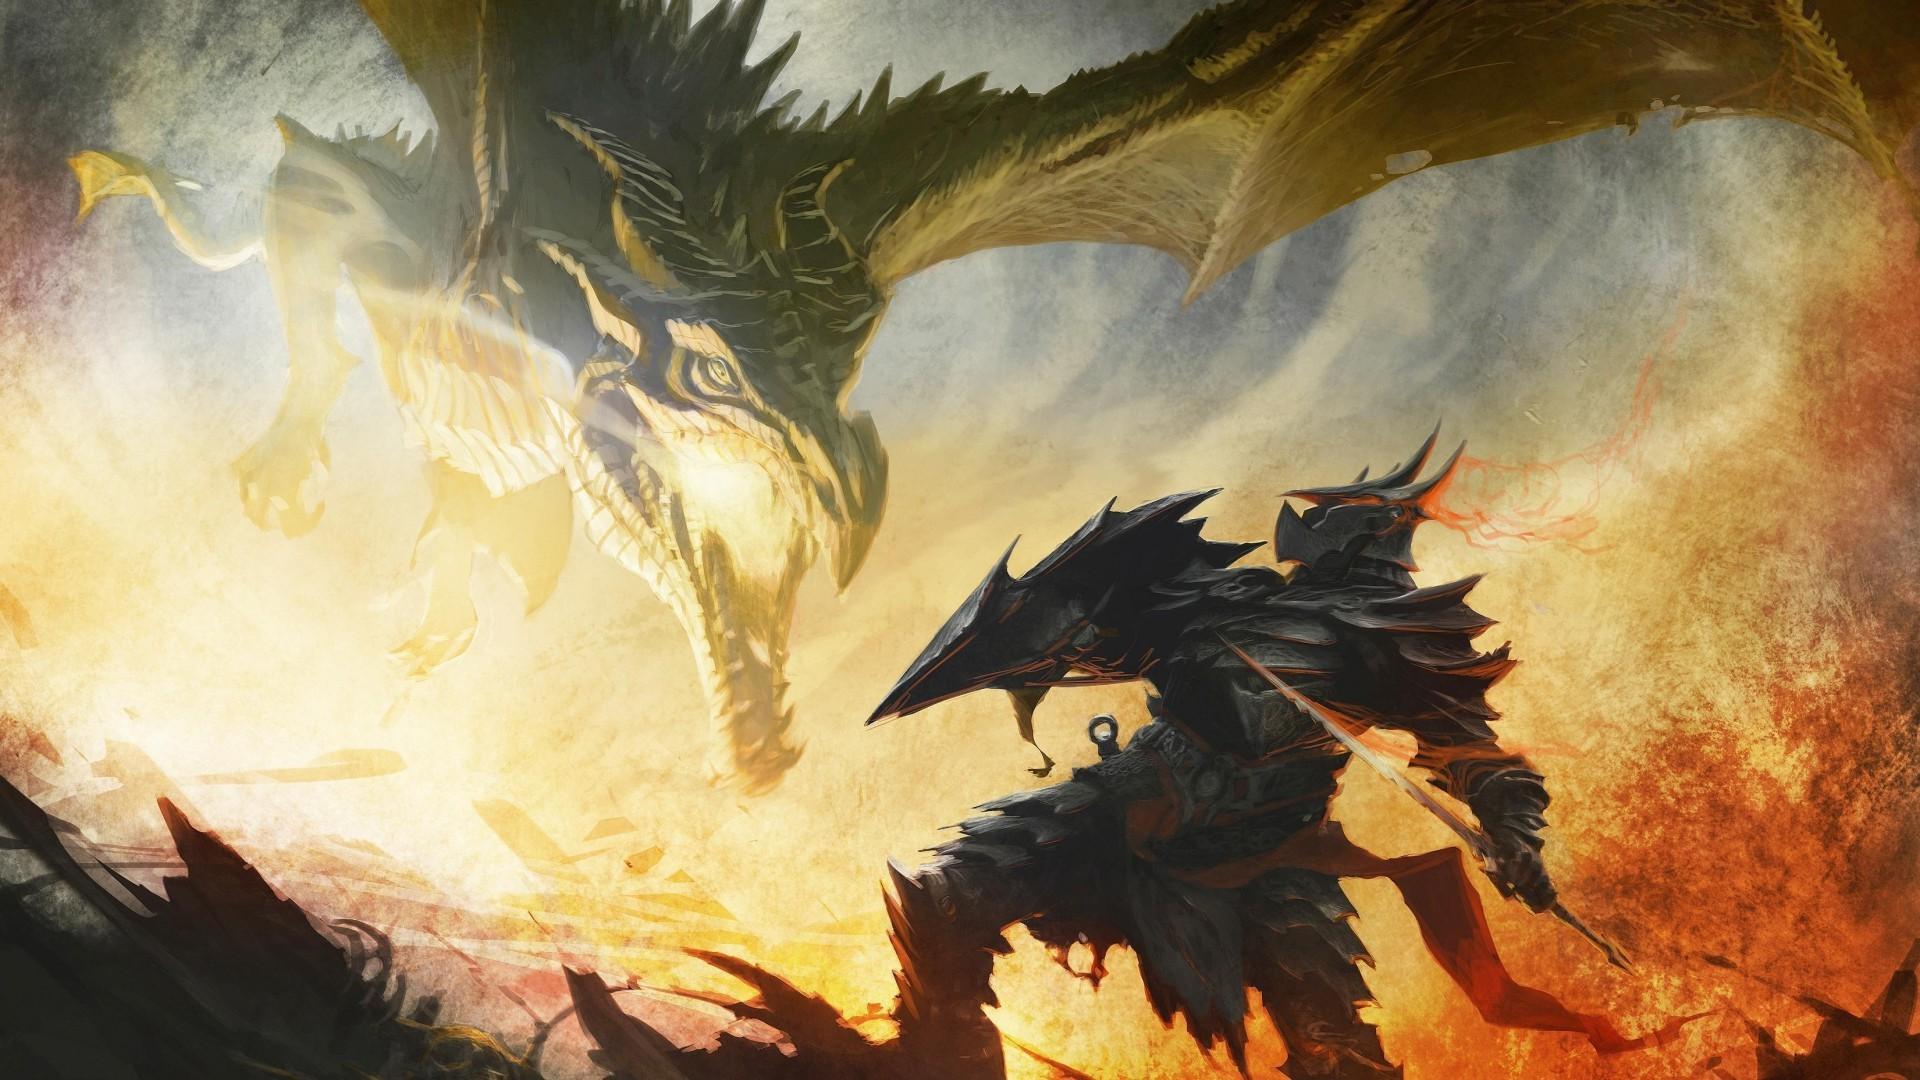 1920x1080 Px Alduin Dragonborn Elder Scrolls V Skyrim